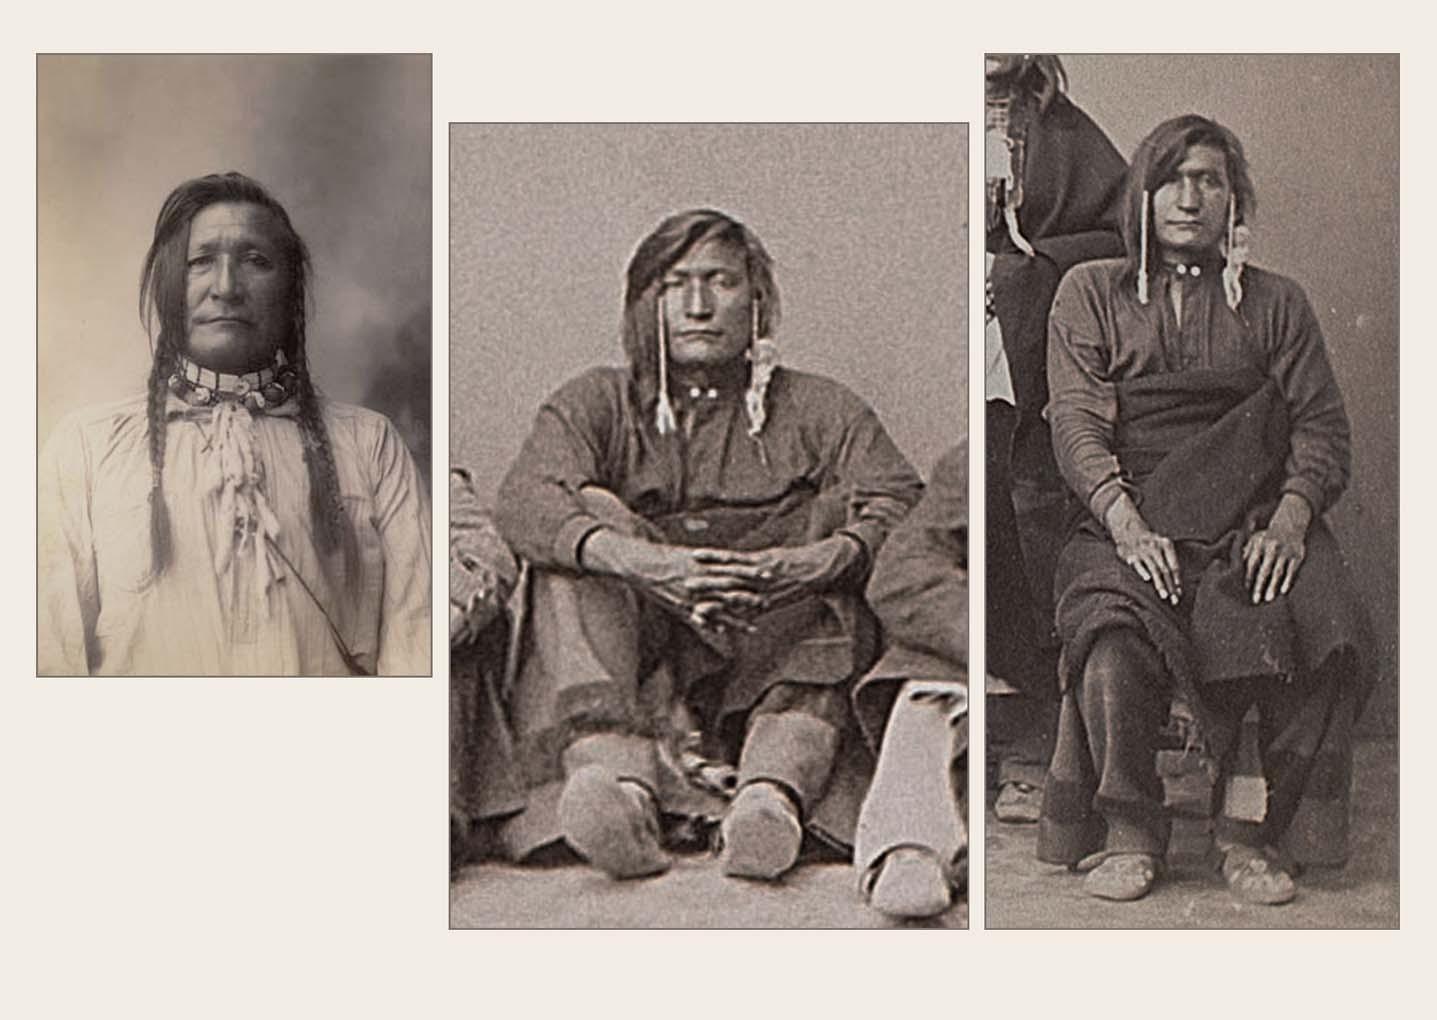 http://www.american-tribes.com/messageboards/dietmar/MountainChiefblackfeet.jpg